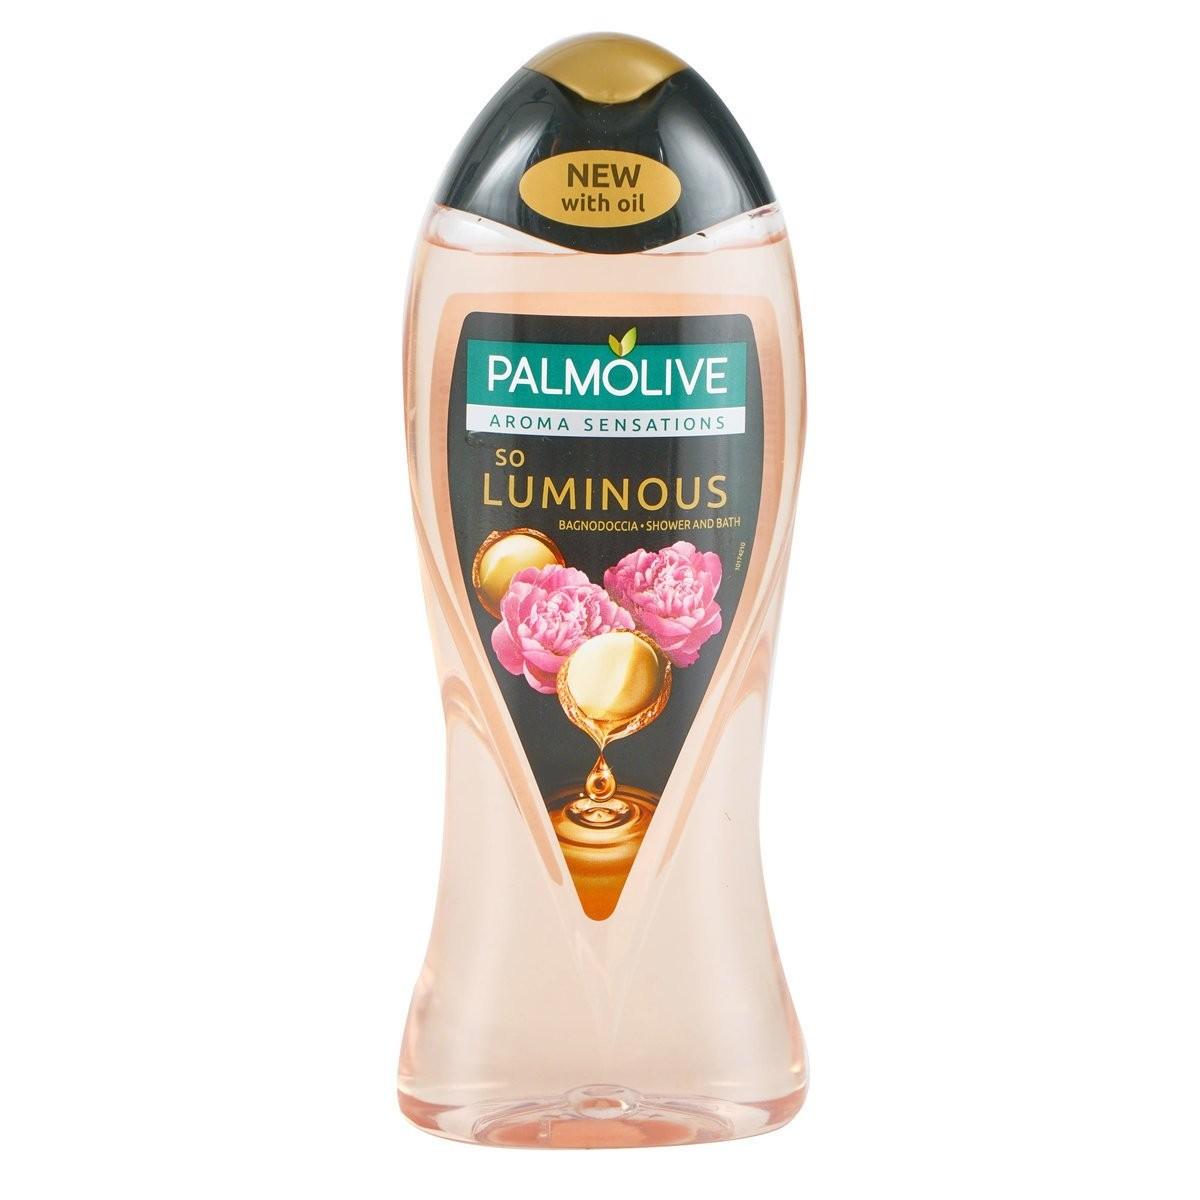 Palmolive Aroma Sensations Bagnodoccia So Lominous